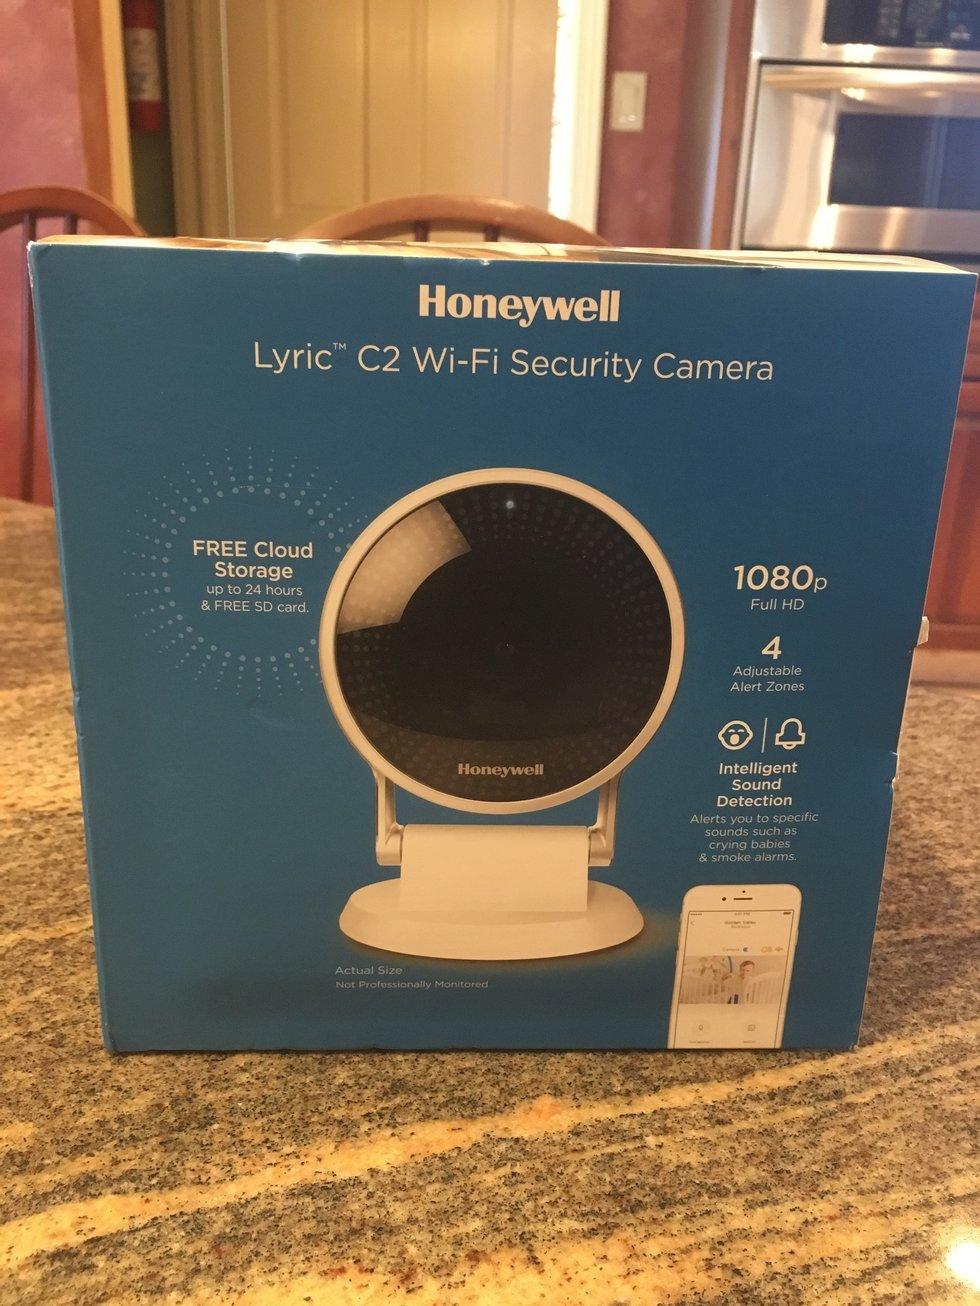 Honeywell Lyric C2 Wi-Fi Security Camera